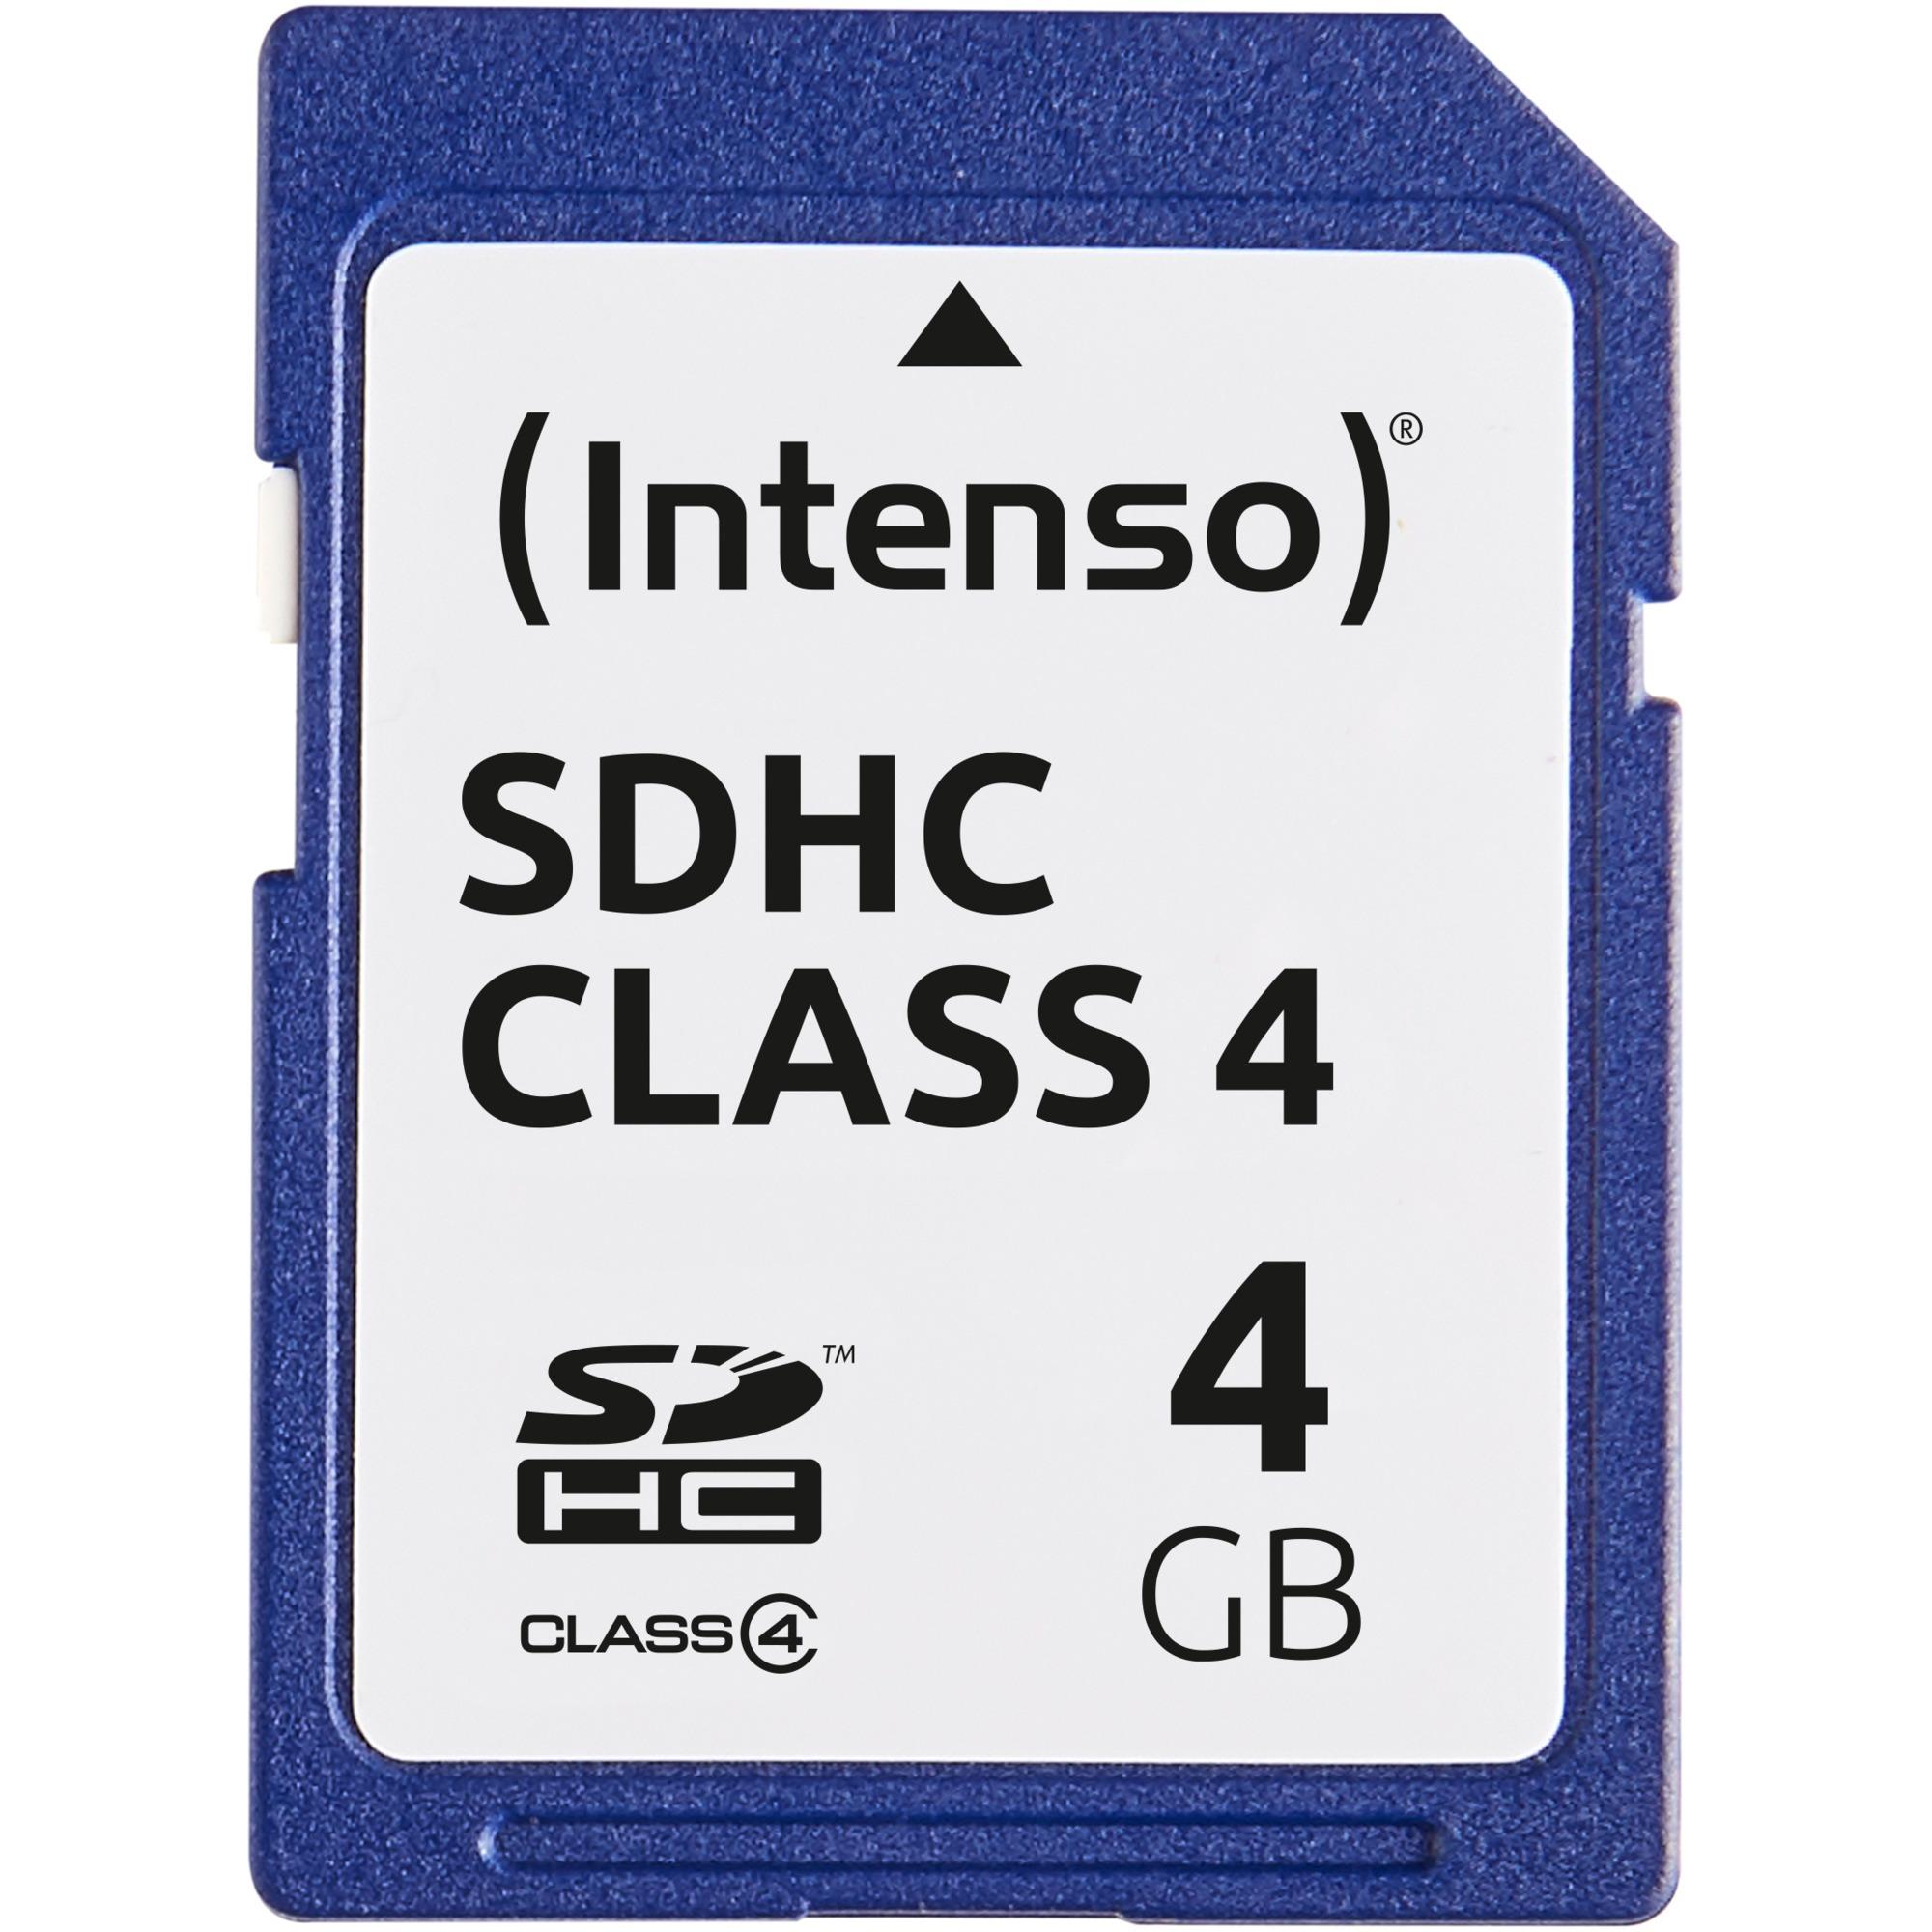 4 GB SDHC High Capacity 4Go SDHC mémoire flash, Carte mémoire